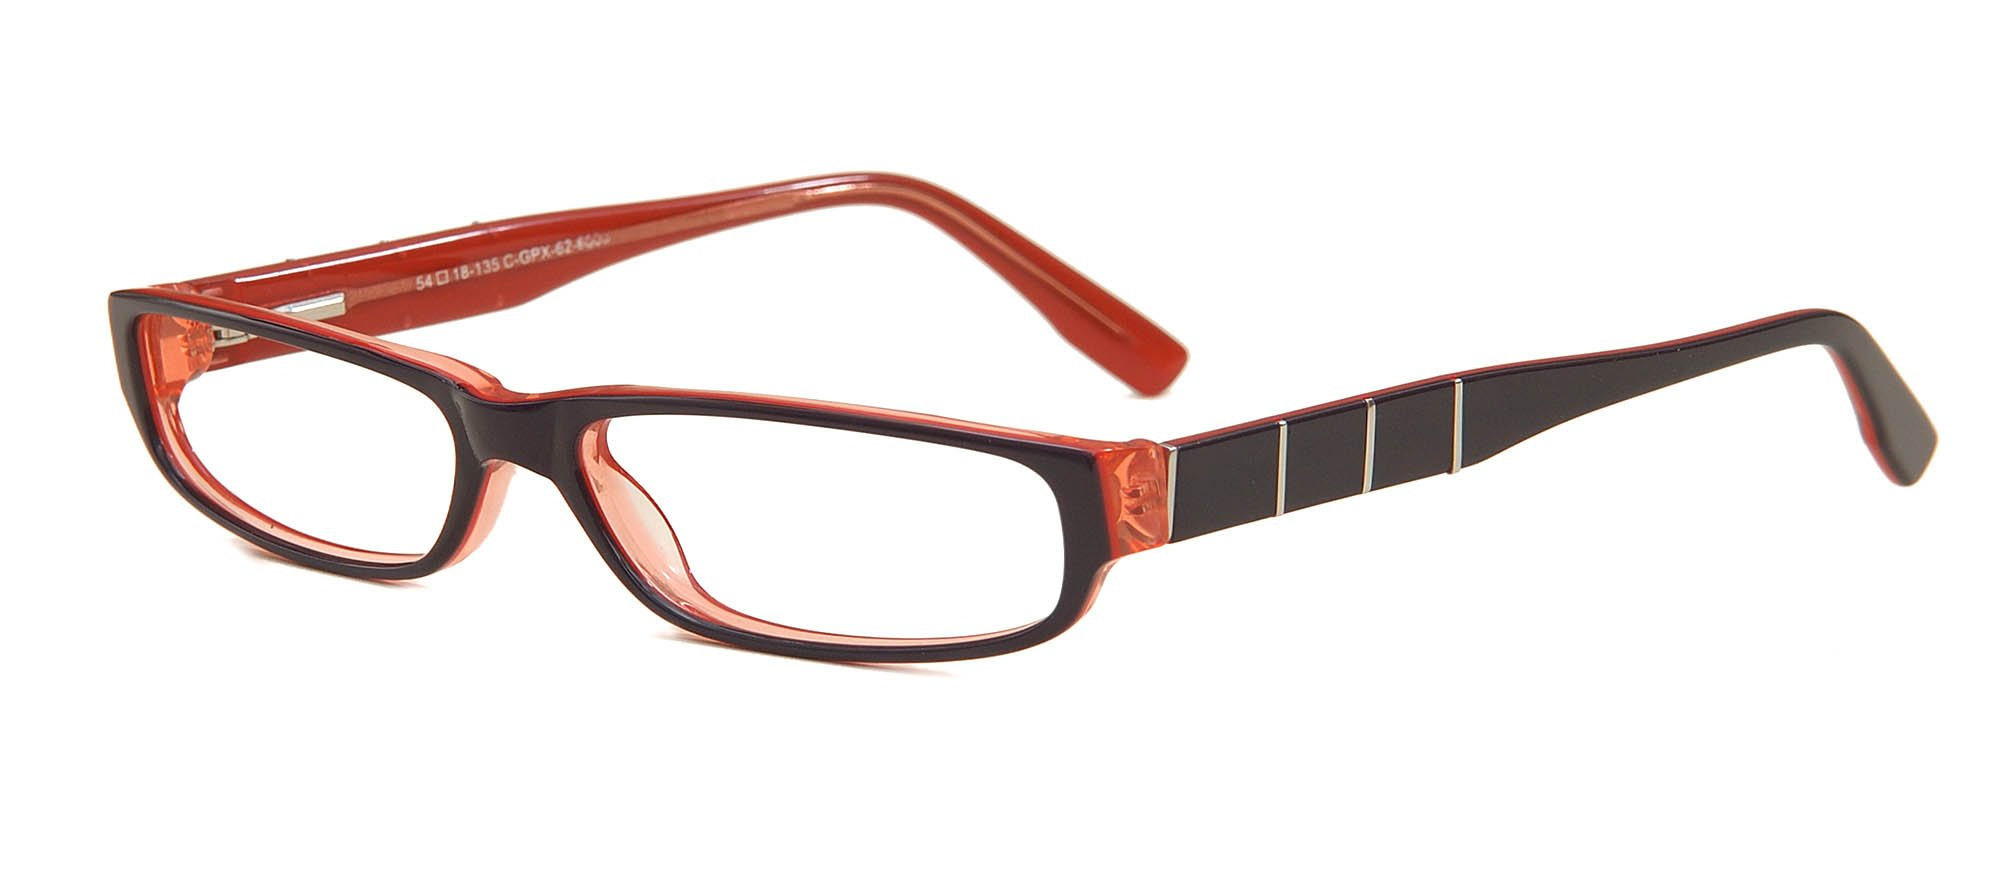 Handmade Acetate Optical Frame - Buy Eyewear Frame Product on ...